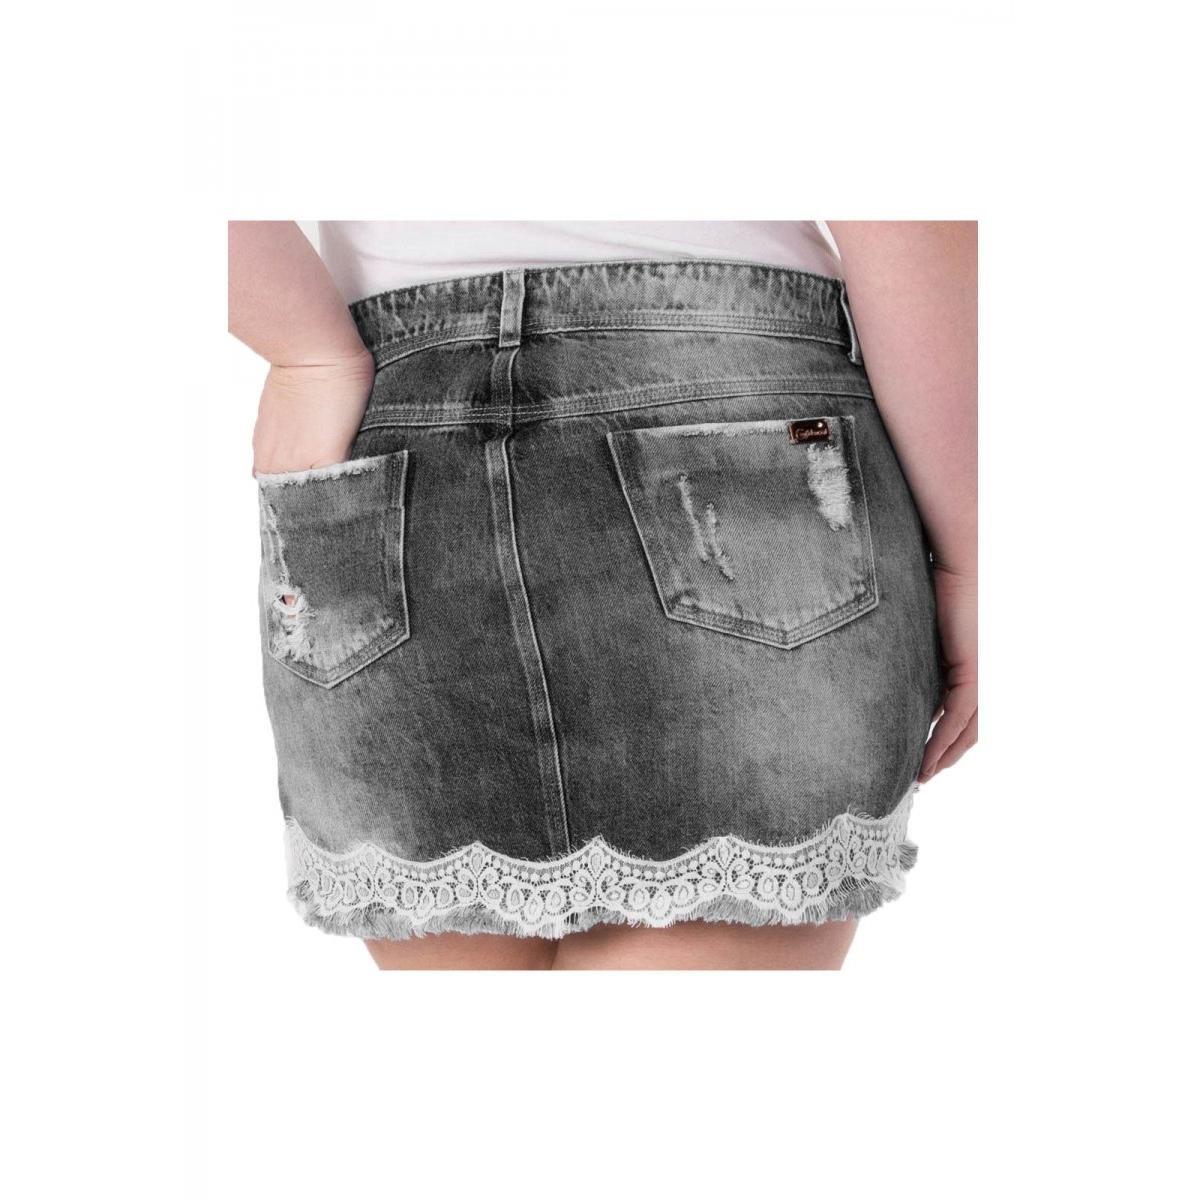 Mini Saia Jeans Confidencial Extra com Renda Plus Size - Preto